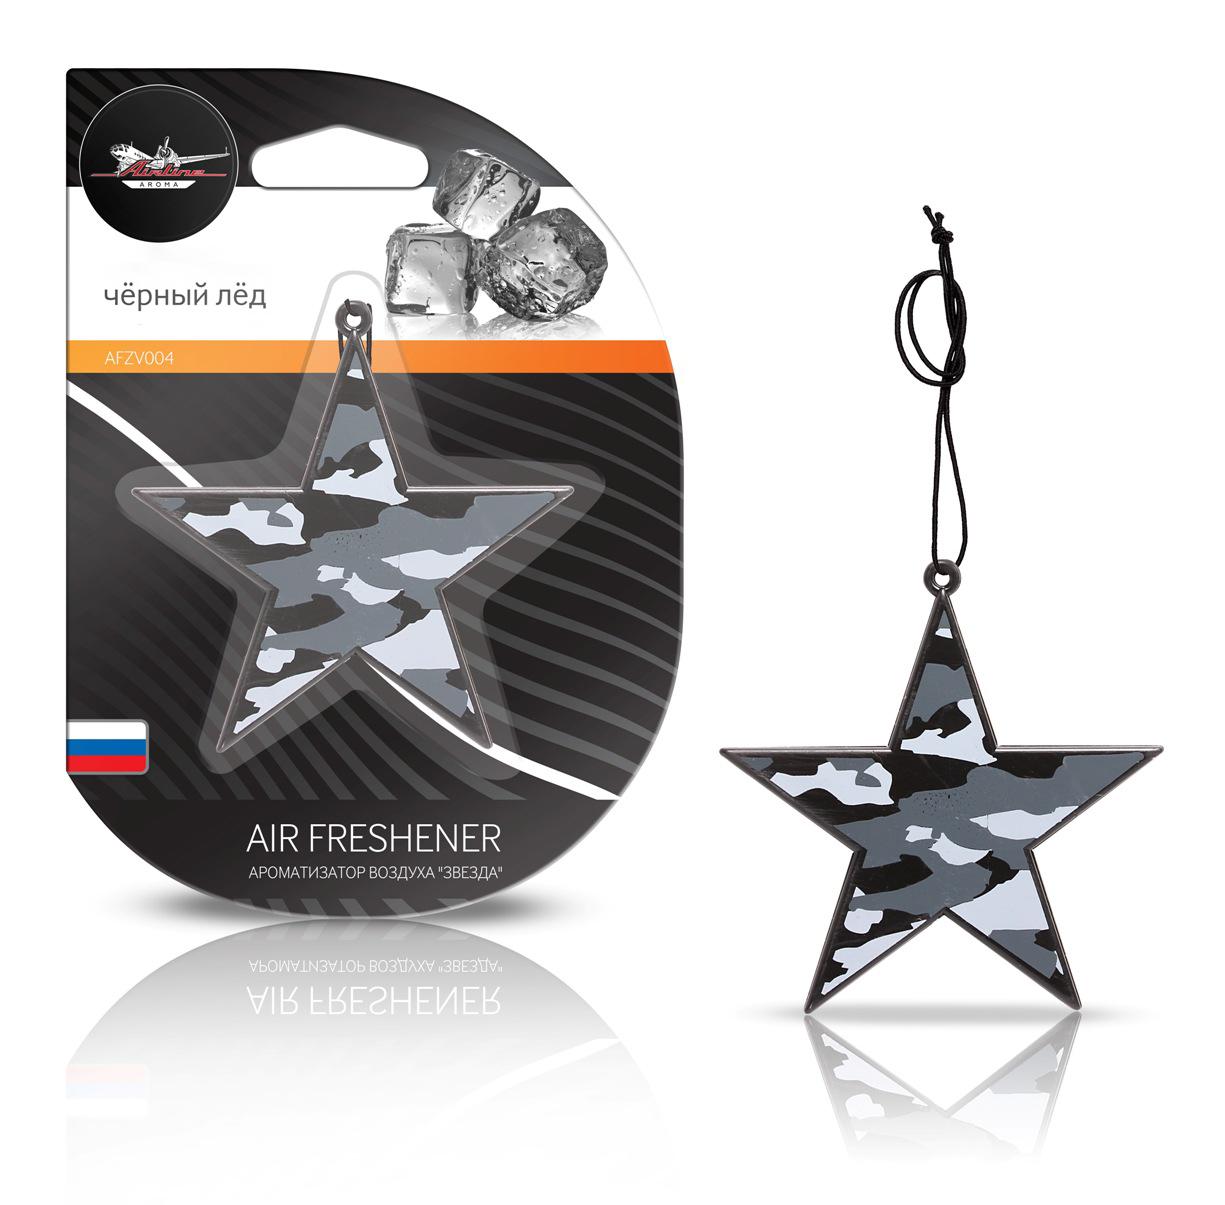 Ароматизатор на зеркало Airline звезда черный лед AFZV004